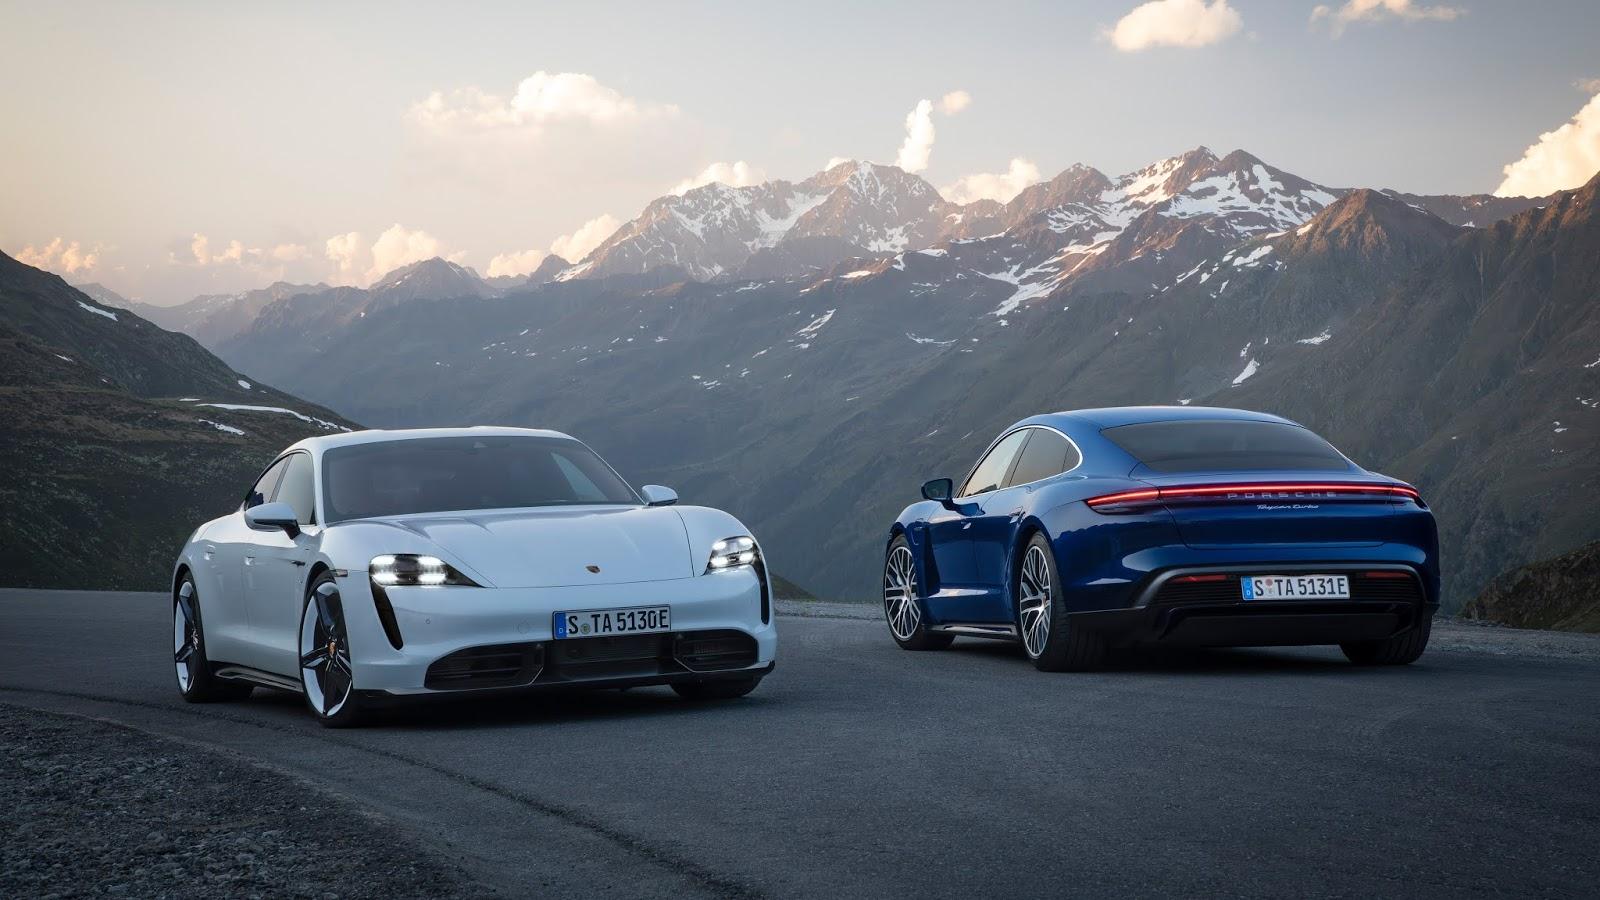 img 52 Porsche Taycan : Το sport αυτοκίνητο, έγινε βιώσιμο